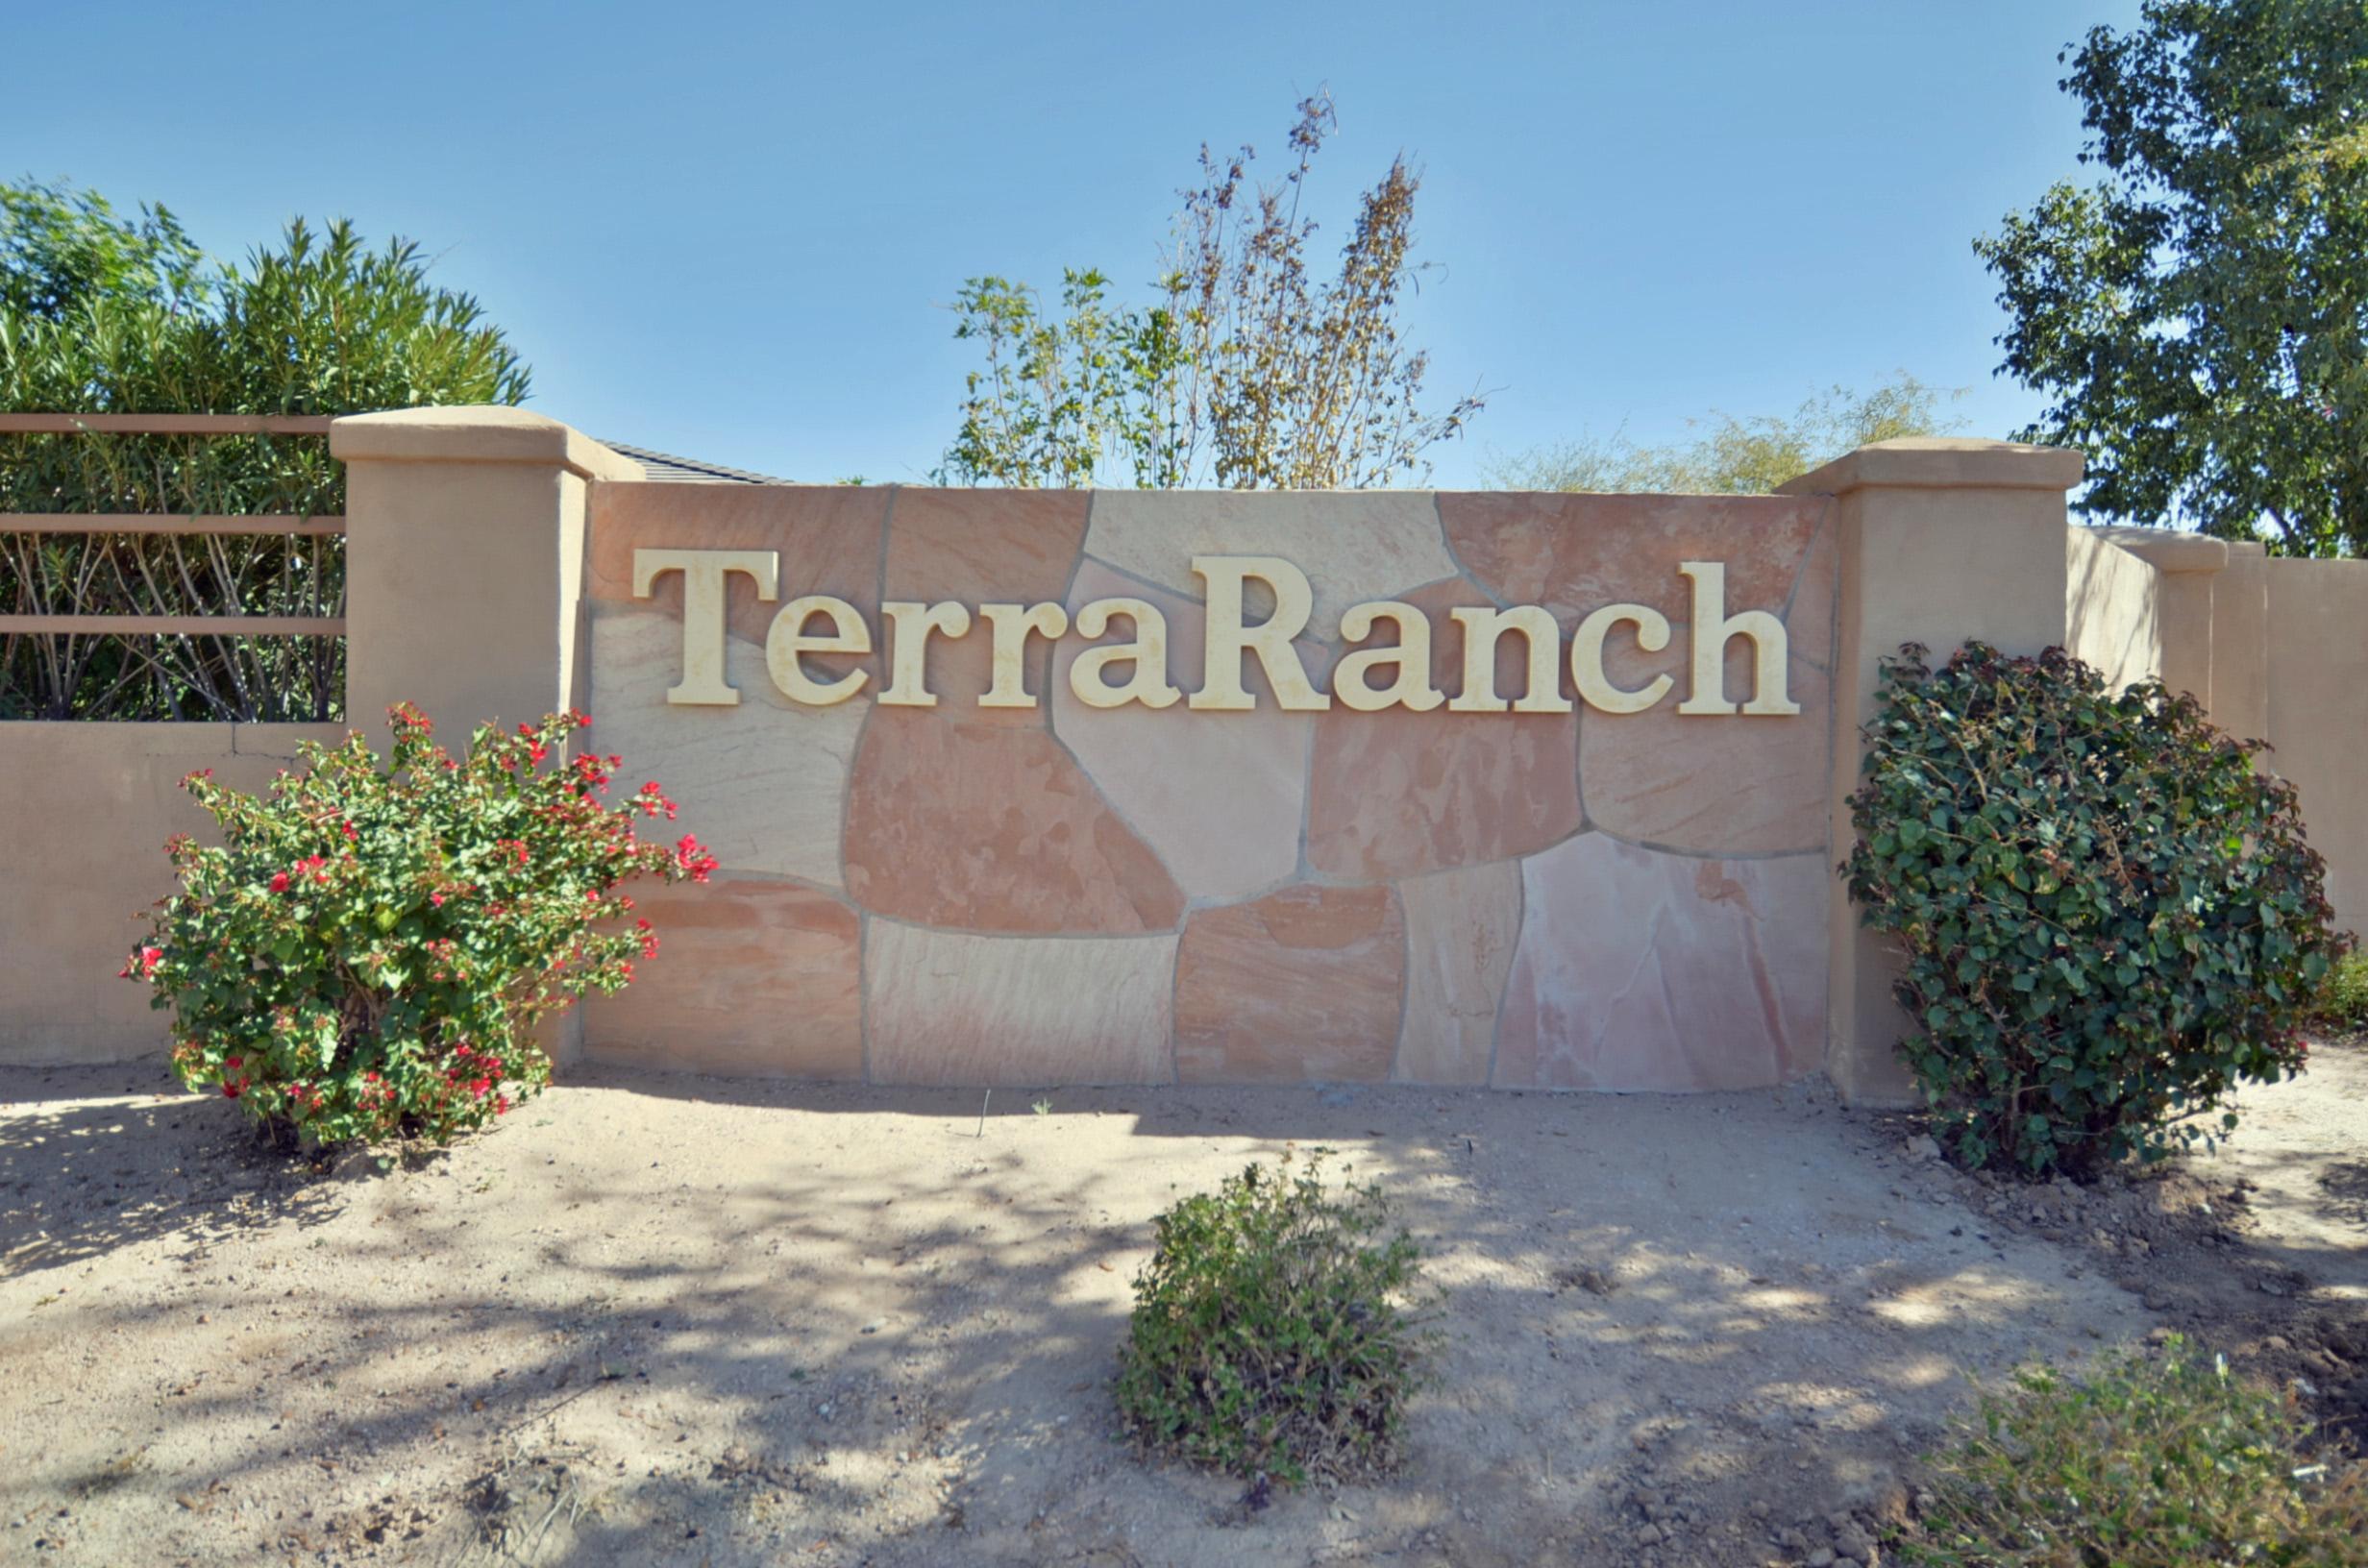 Homes for sale in Terra Ranch in Queen Creek AZ